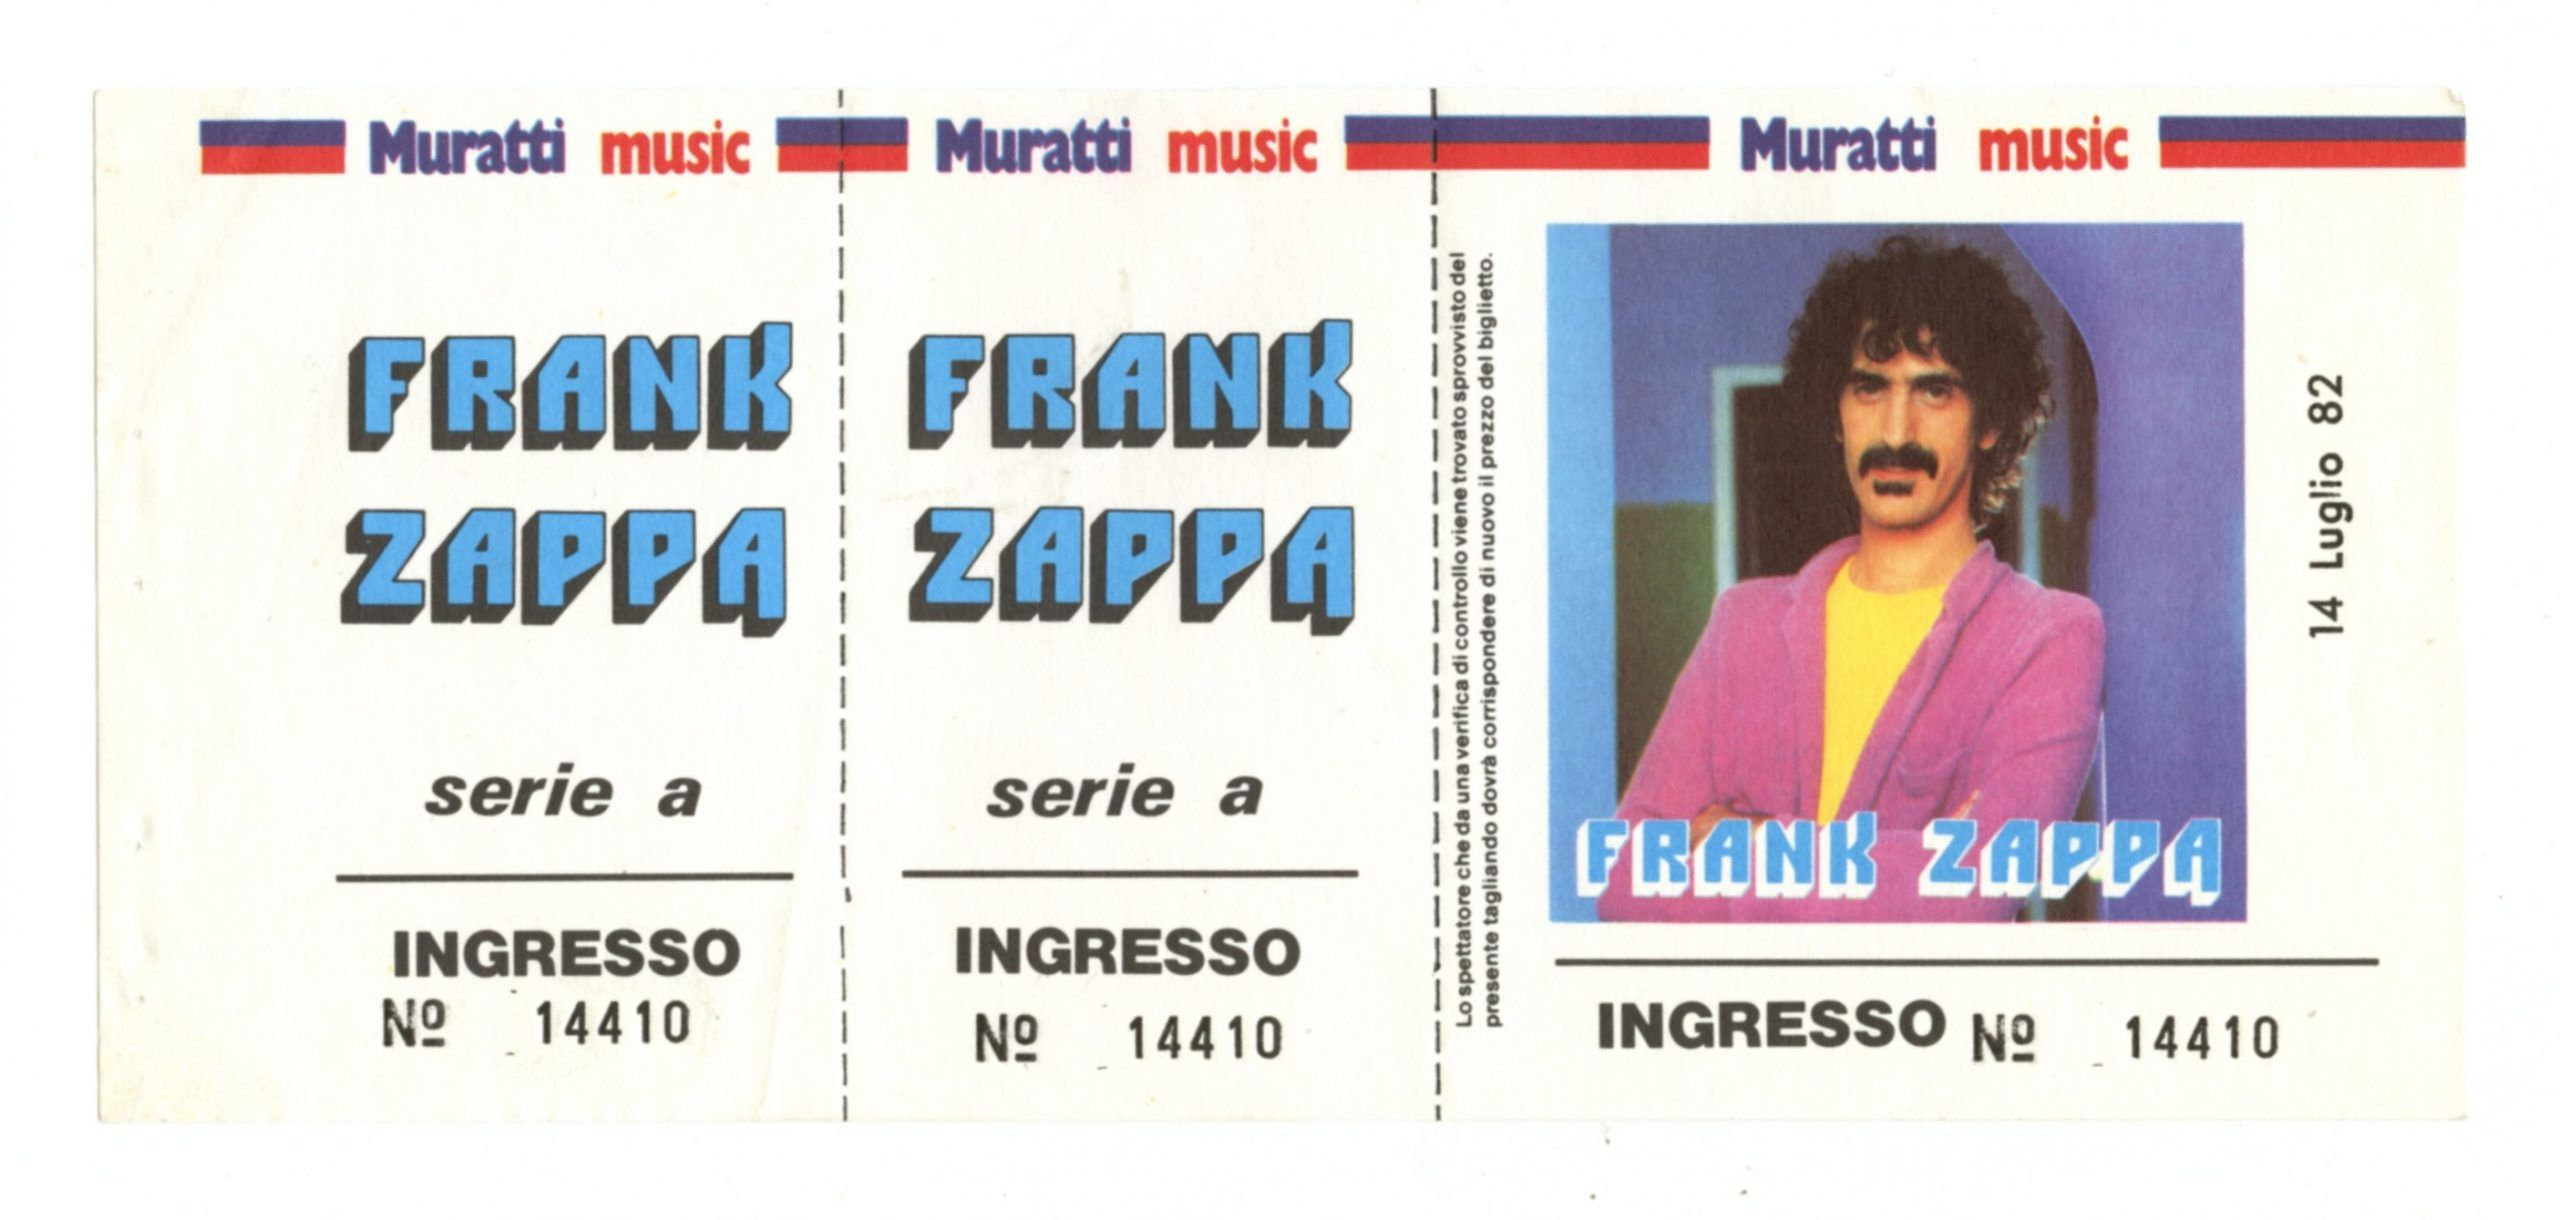 Frank Zappa Ticket 1982 Jul 14 Stadio Communale Favorita Palermo Italy Unused